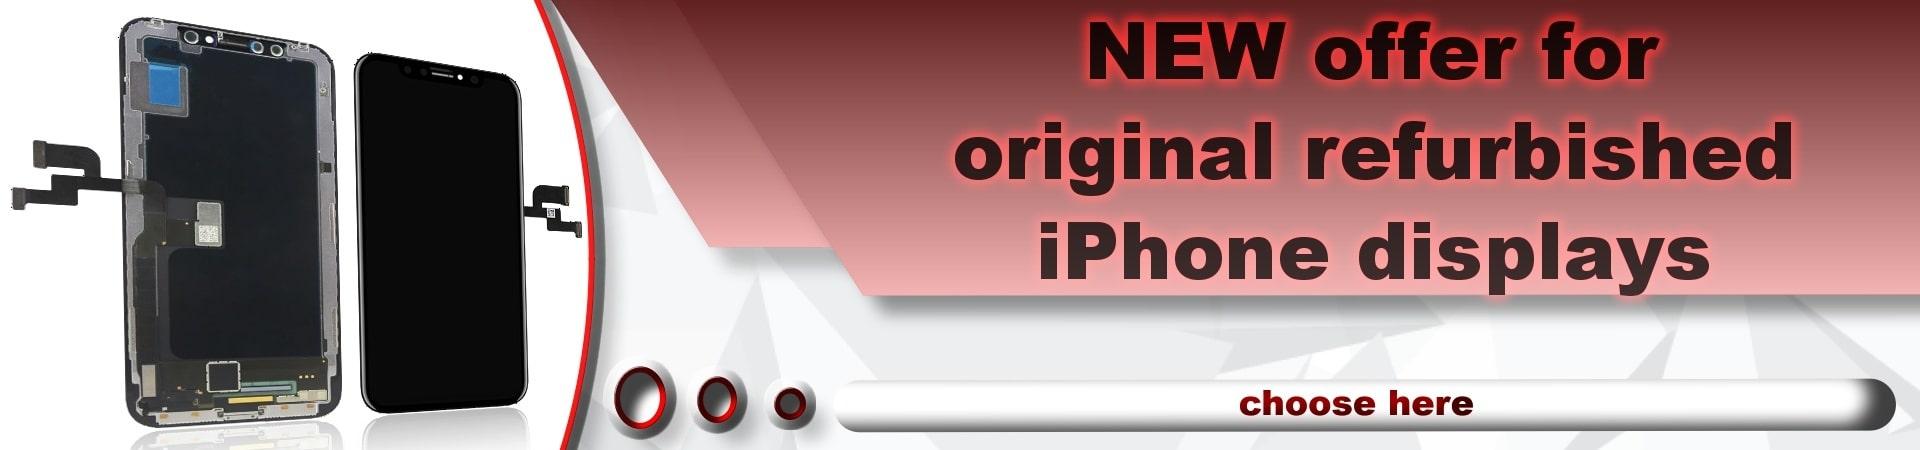 LCD iPhone screen refurb